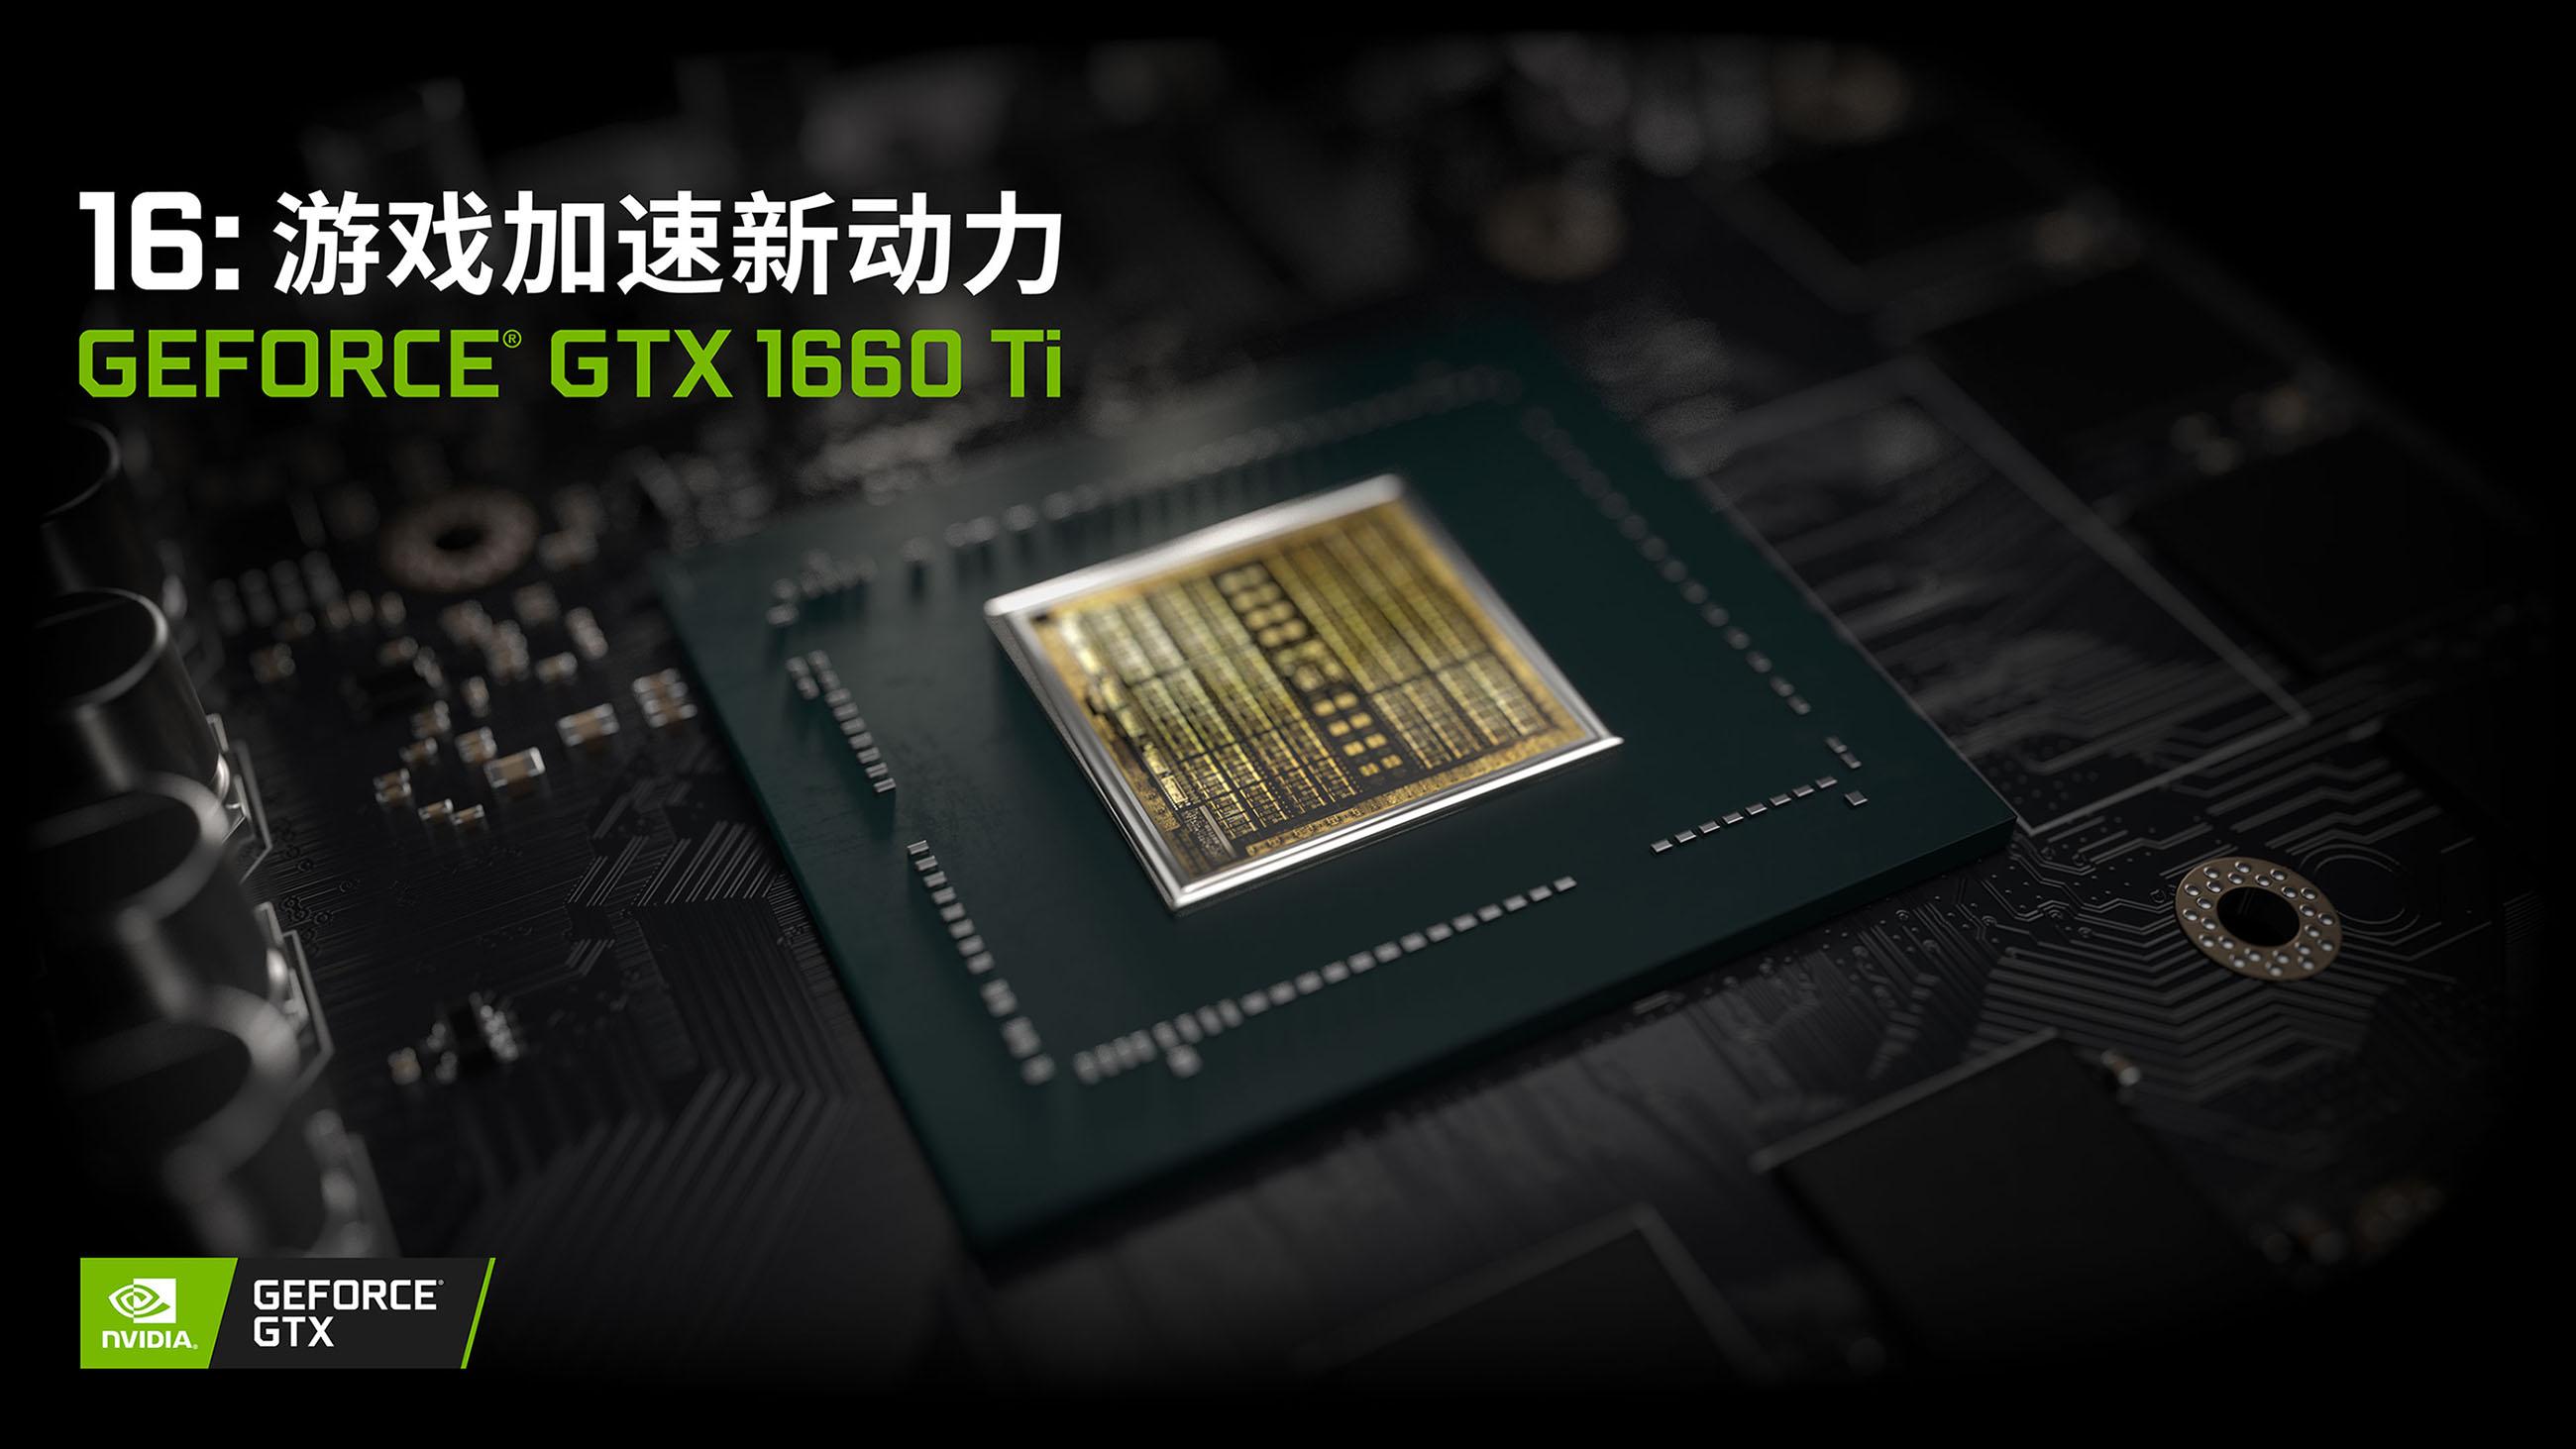 GeForce GTX 1660Ti来了 畅玩剑网3极致画质